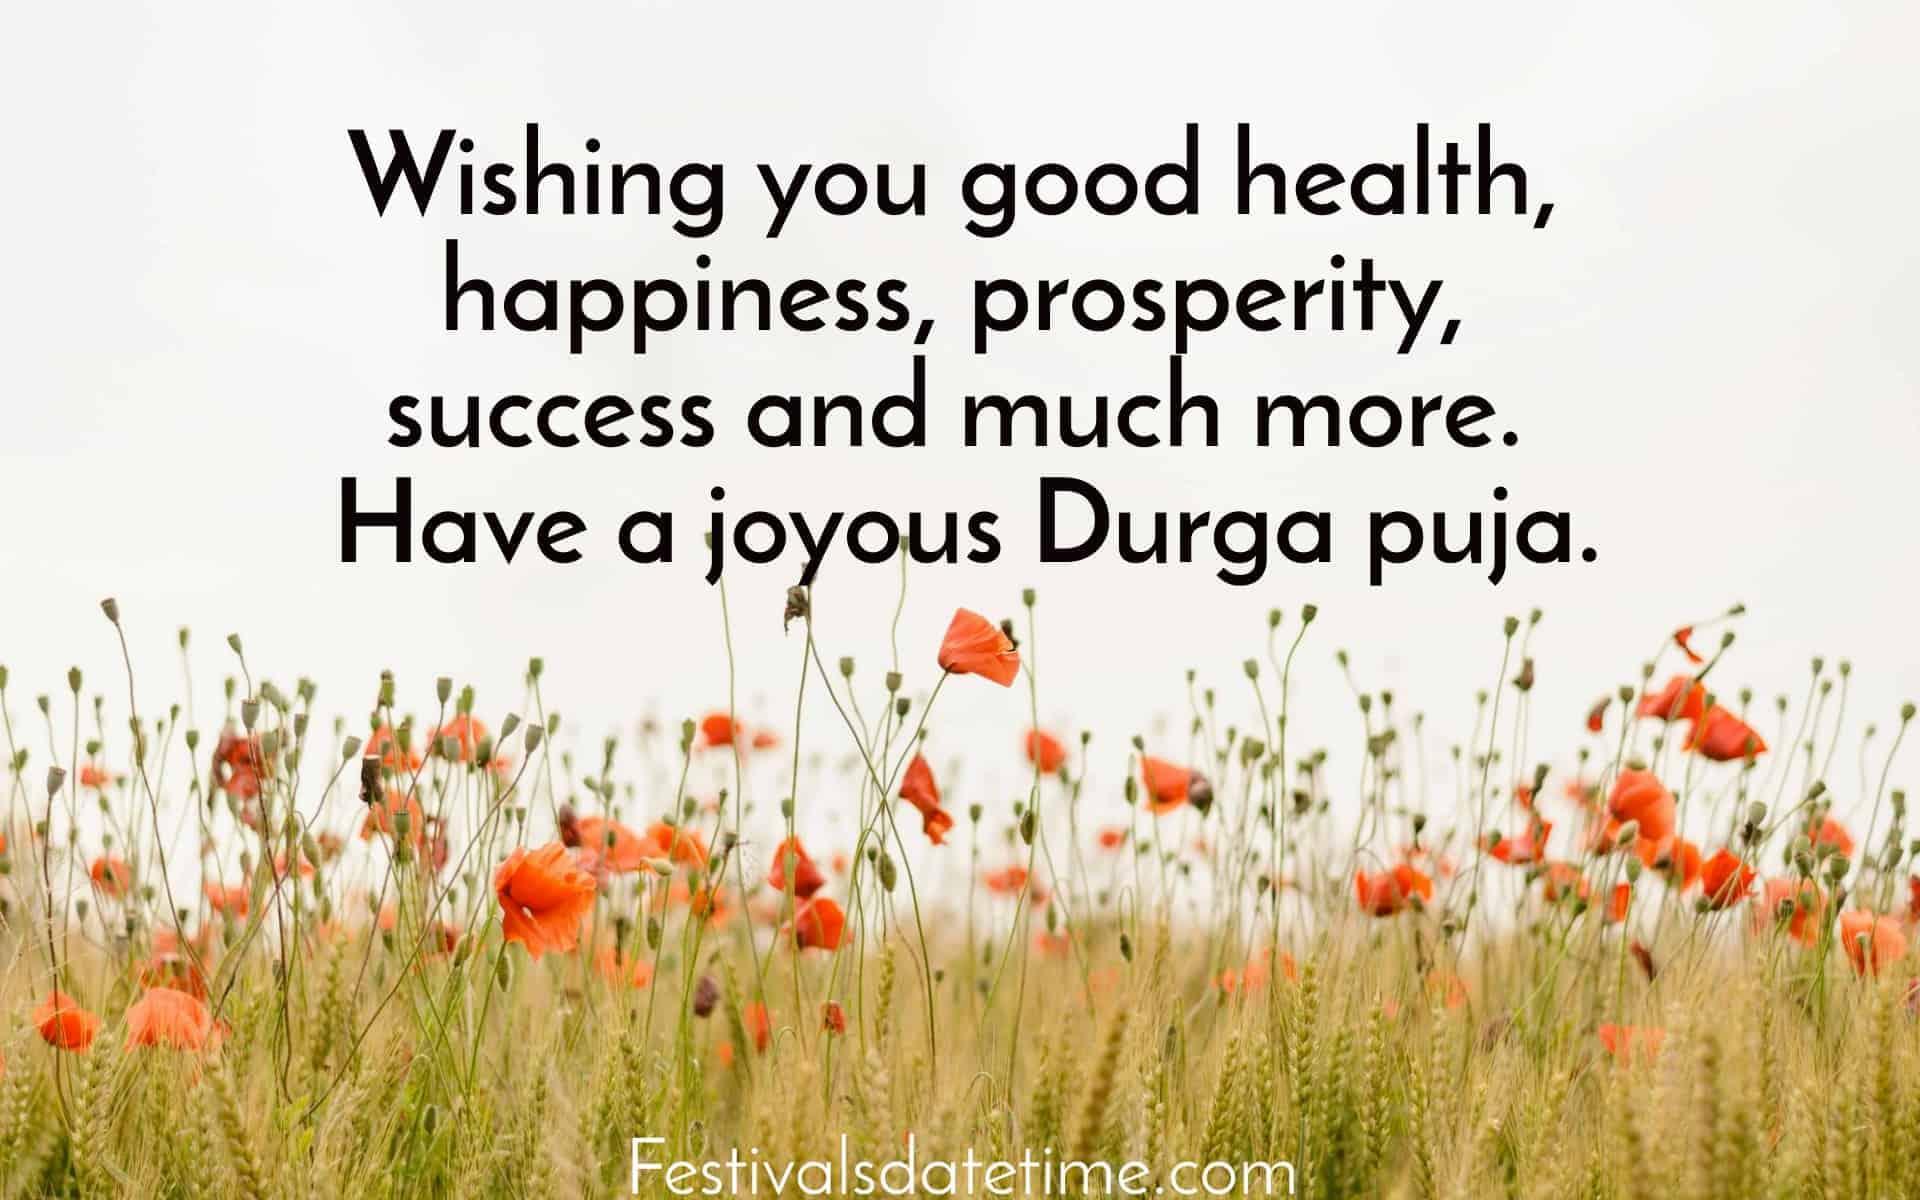 durga_puja_wishes_in_english